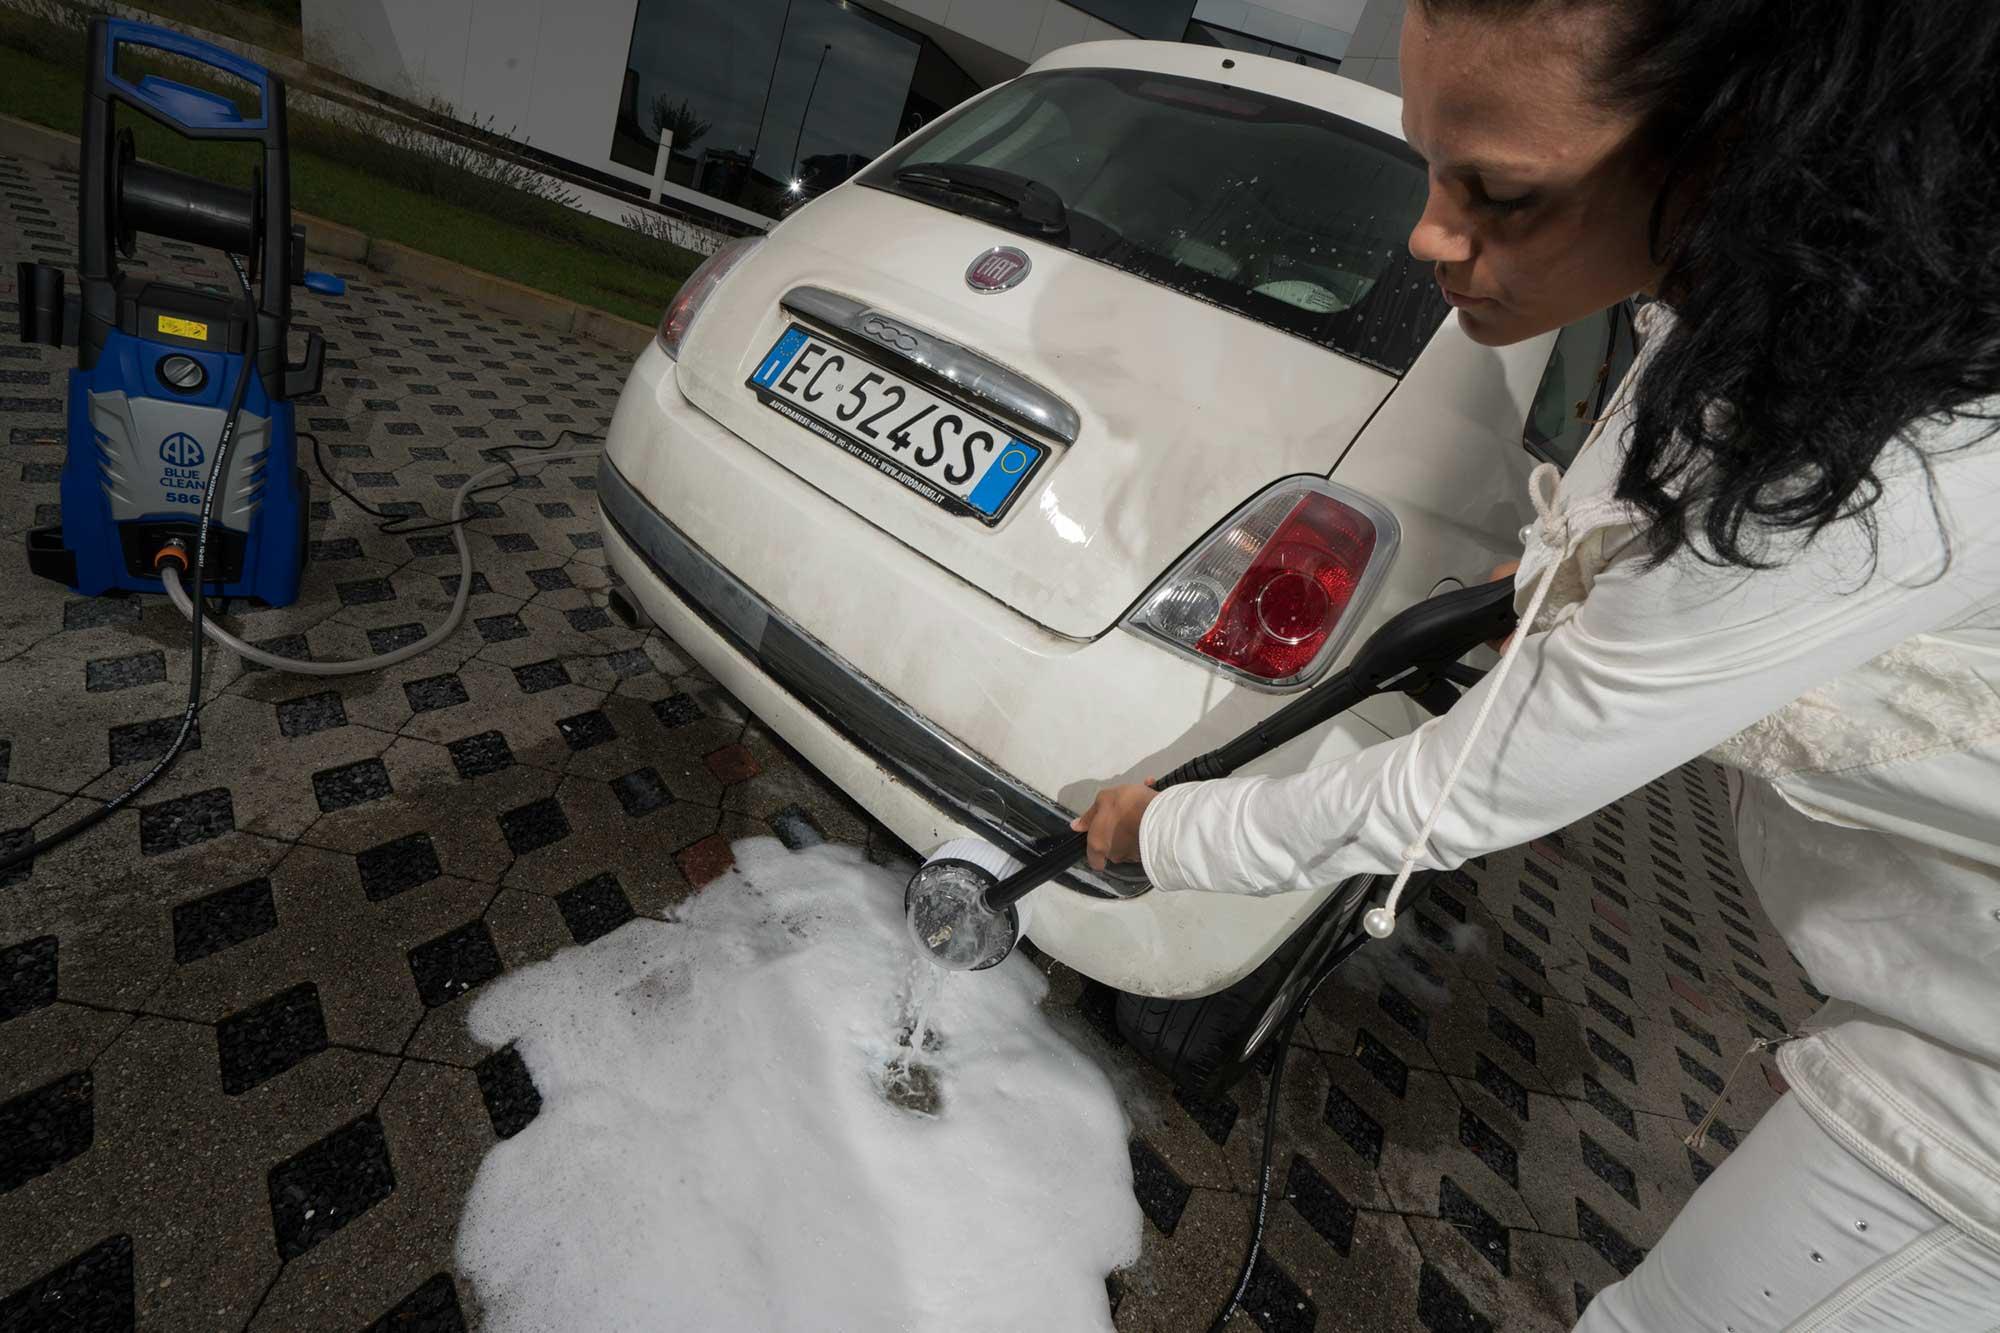 pulire macchina con idropulitrice